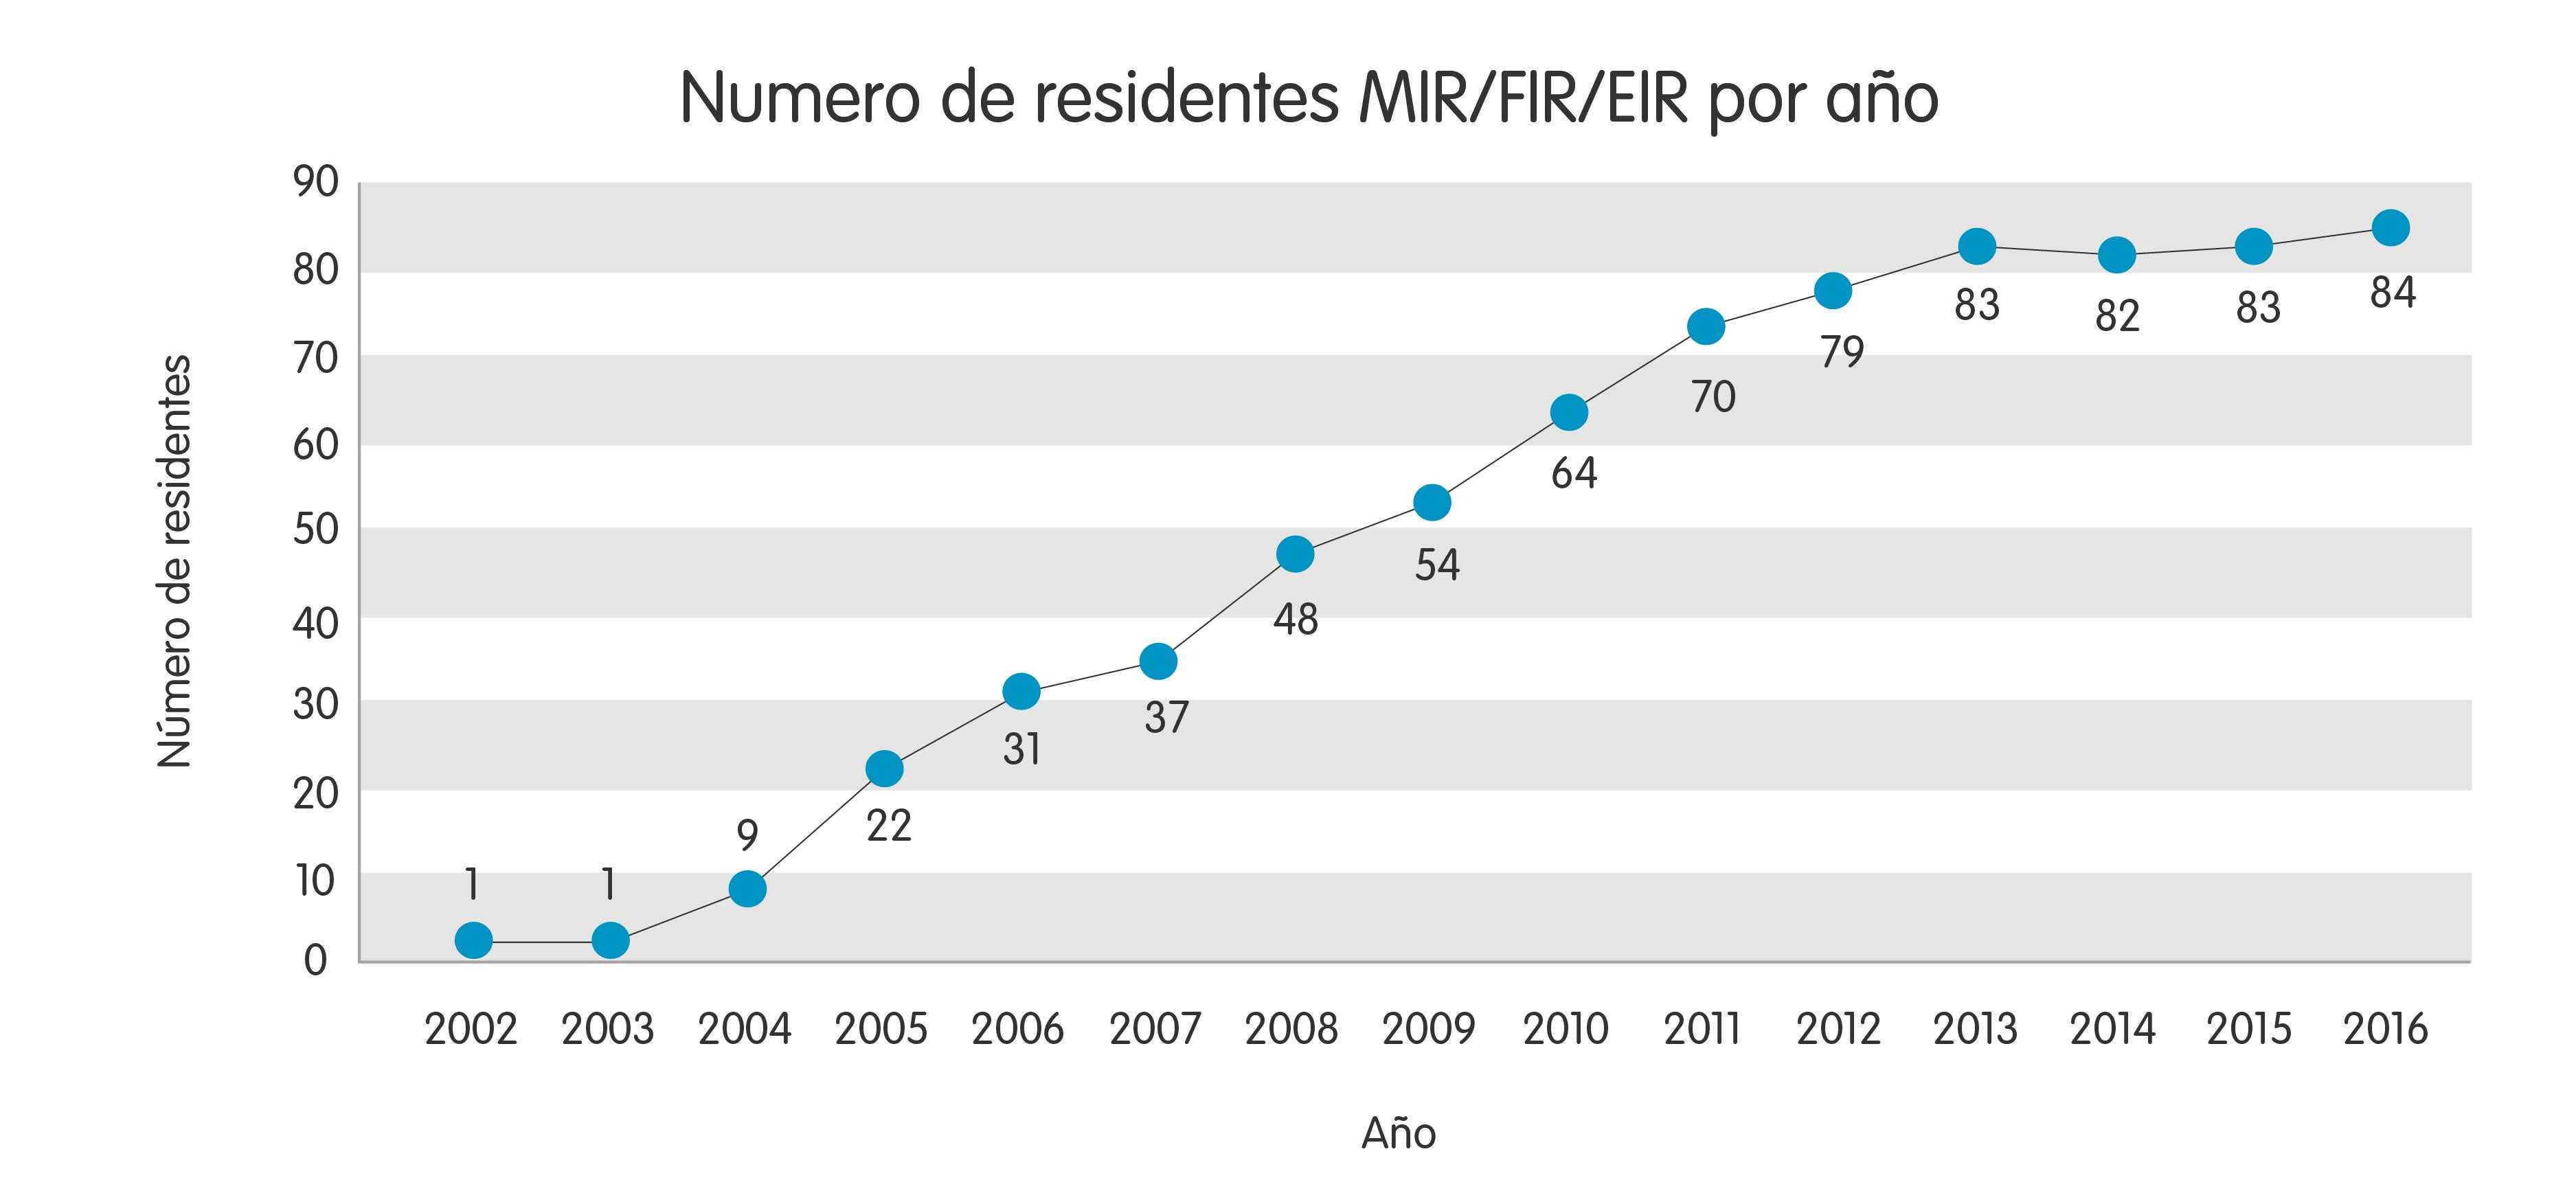 Nº de residentes MIR/FIR/EIR por año